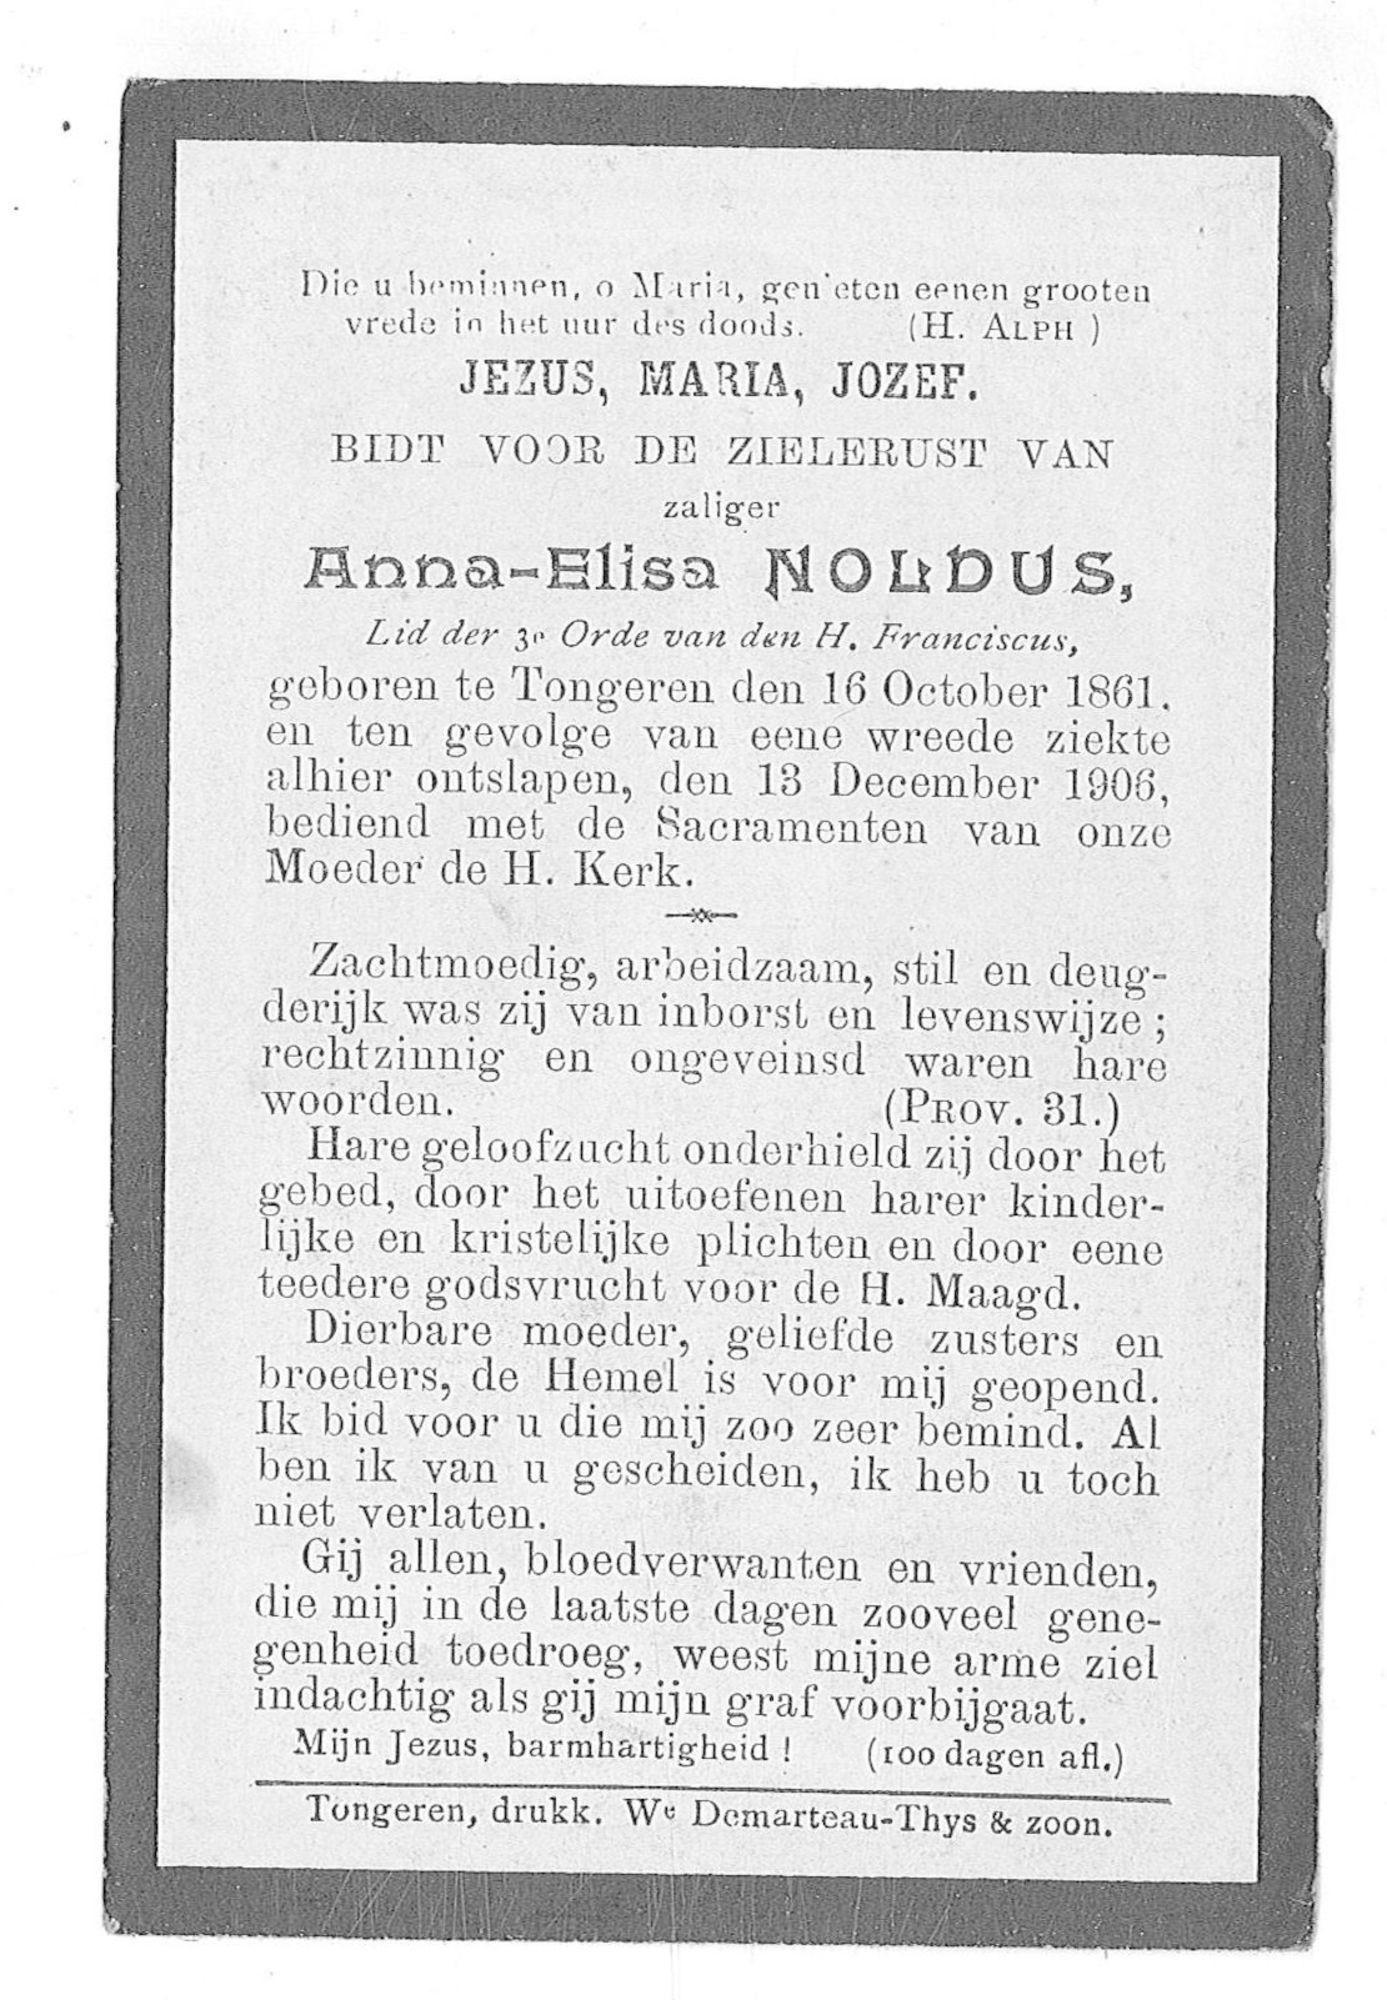 Anna-Elisa Noldus